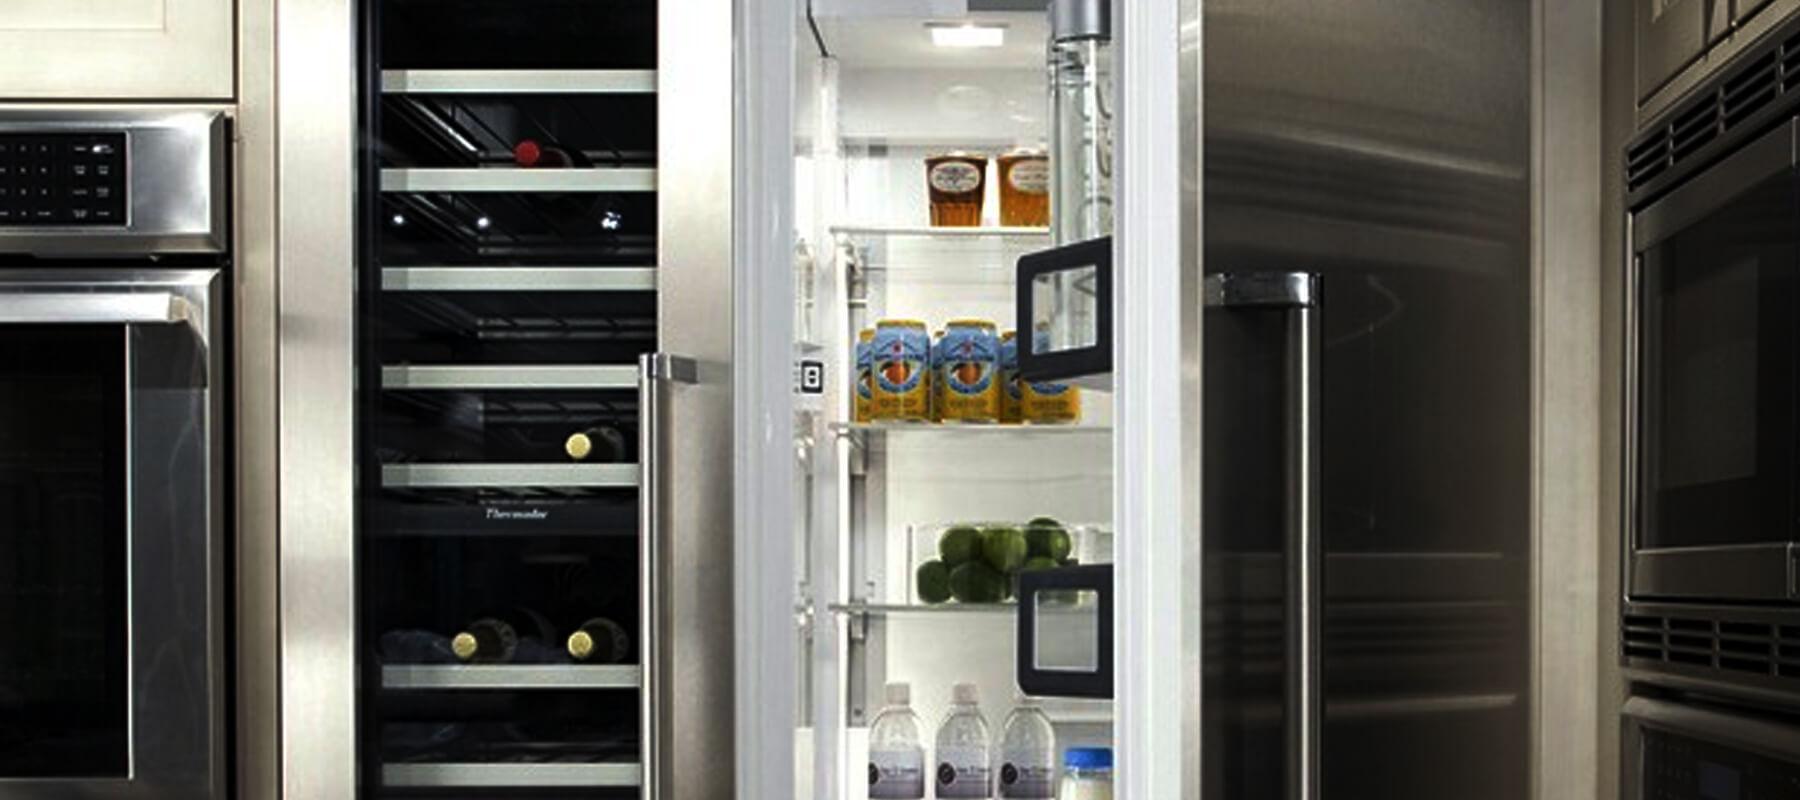 Built in Wine Refrigerator Burbank | Built-in Refrigerator Repair